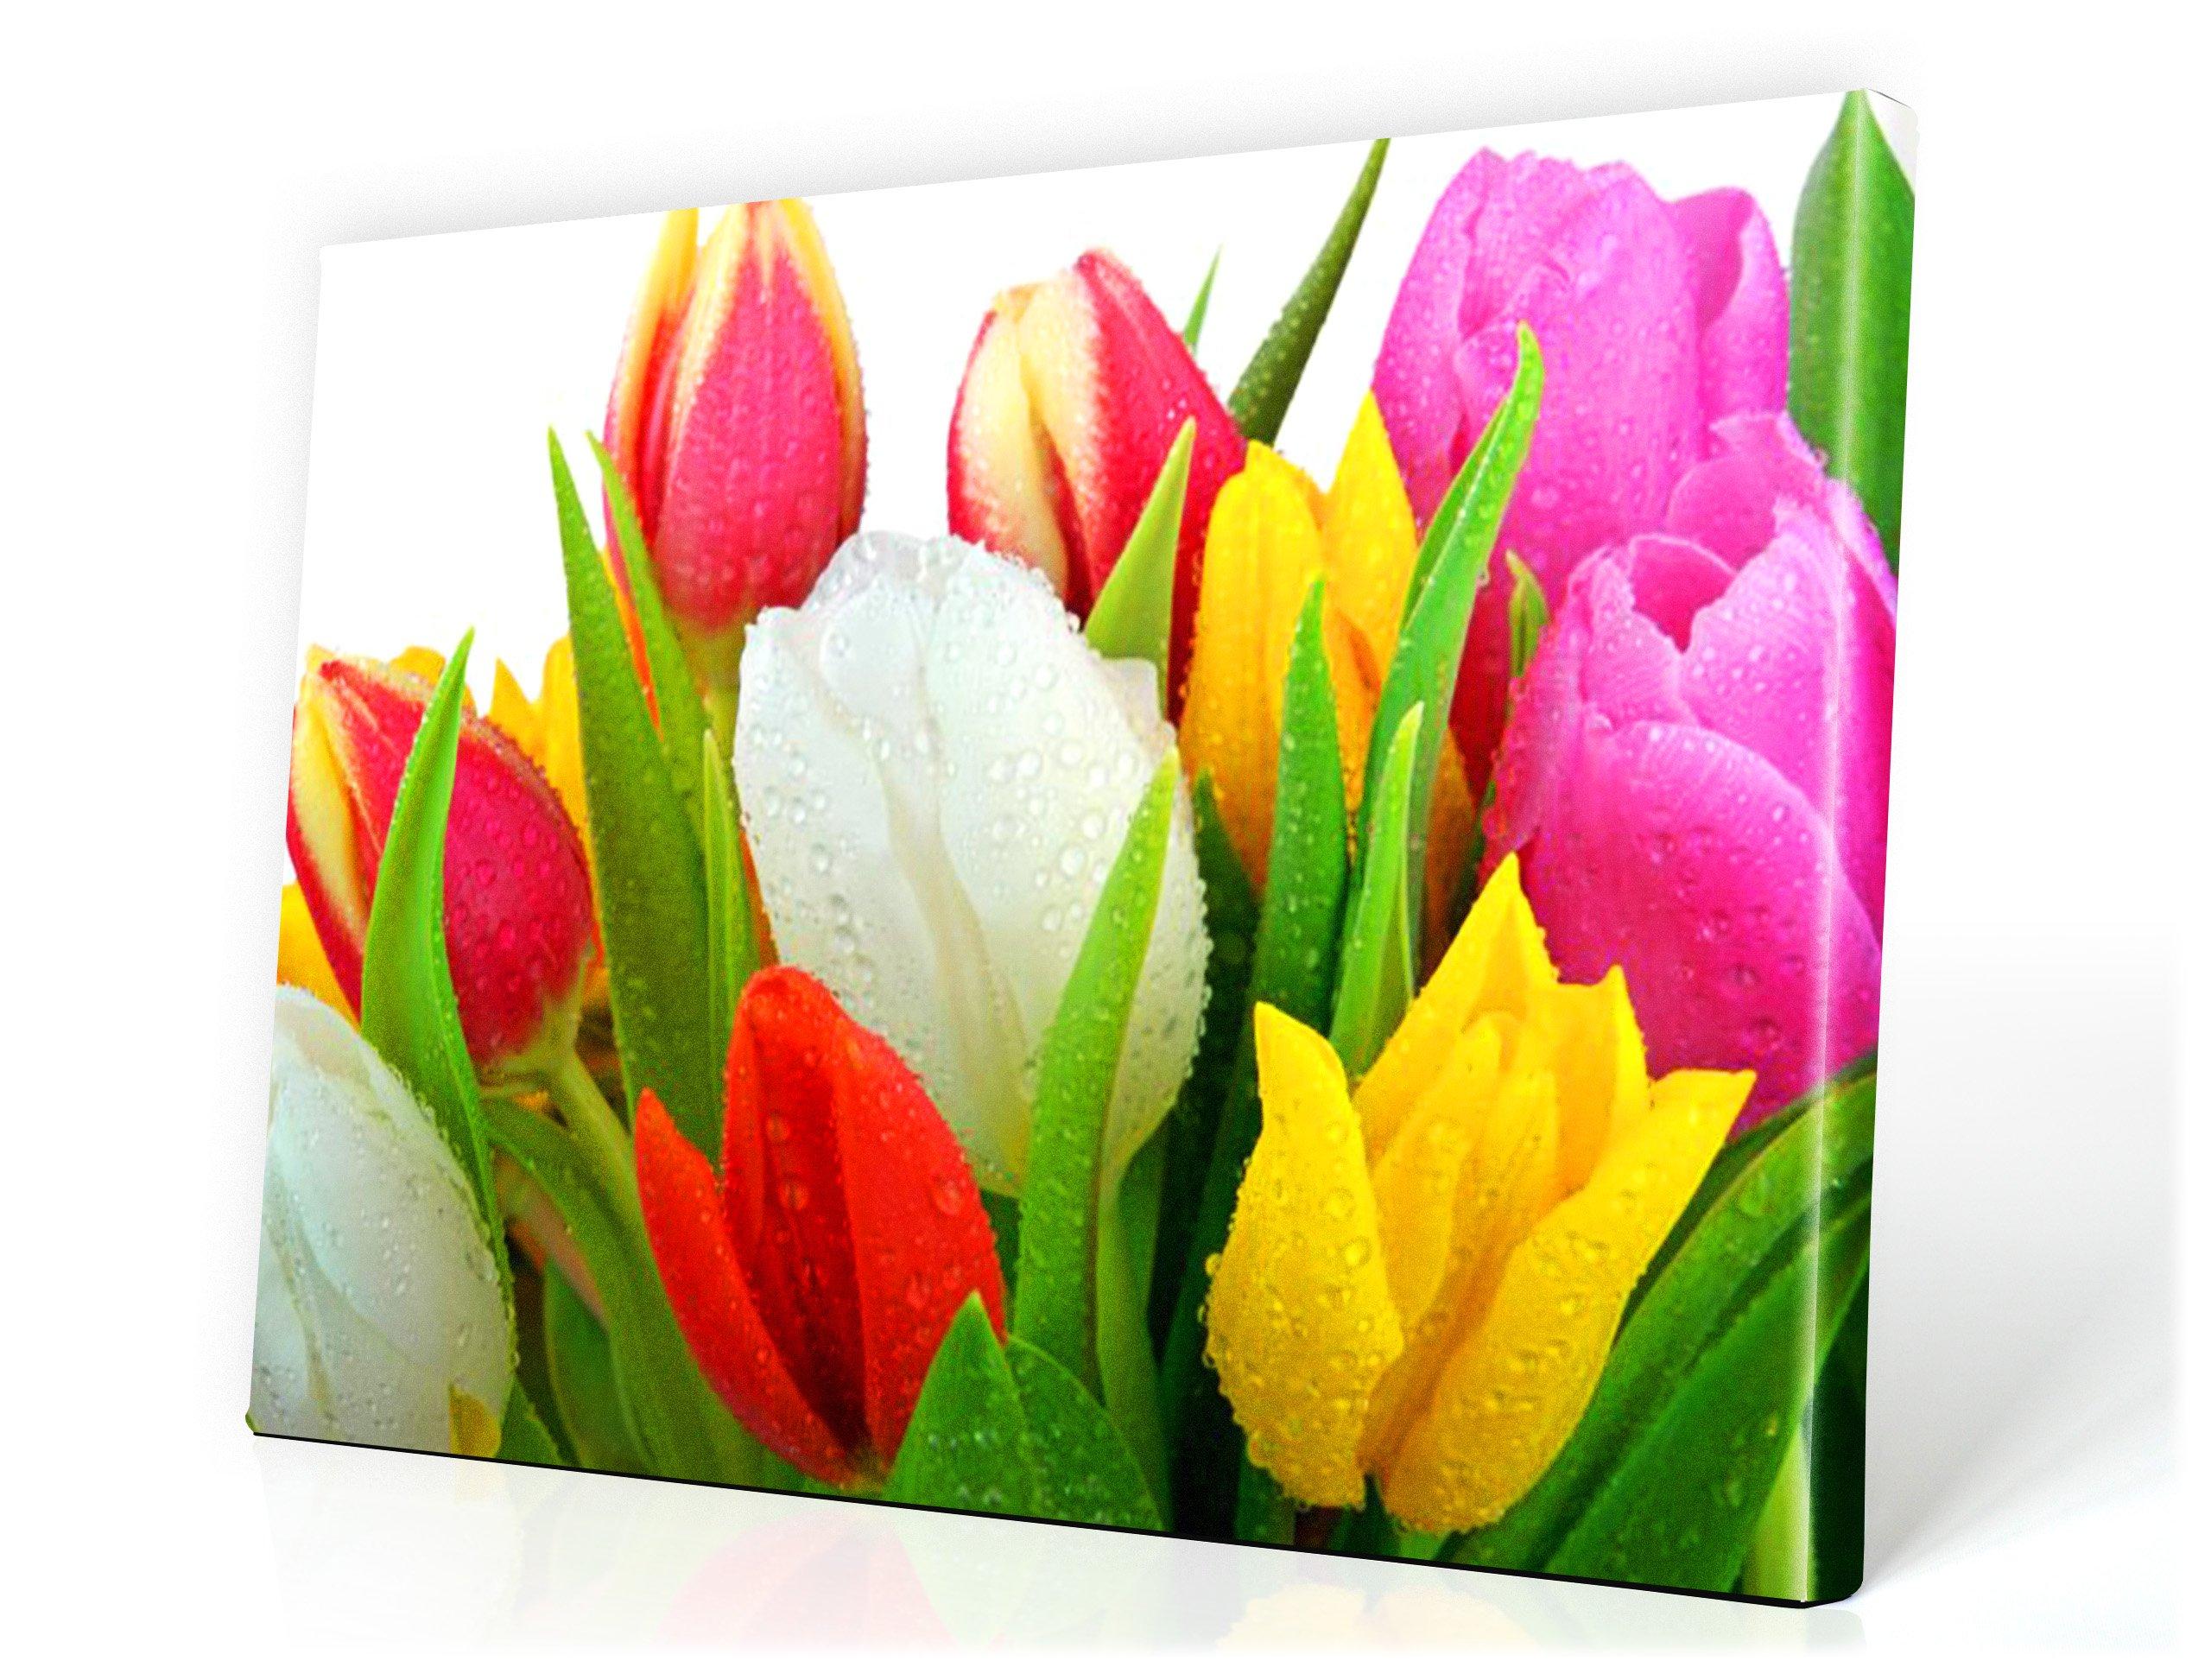 Obrázok 80x60cm Flowers Tulips Spa Obrázky